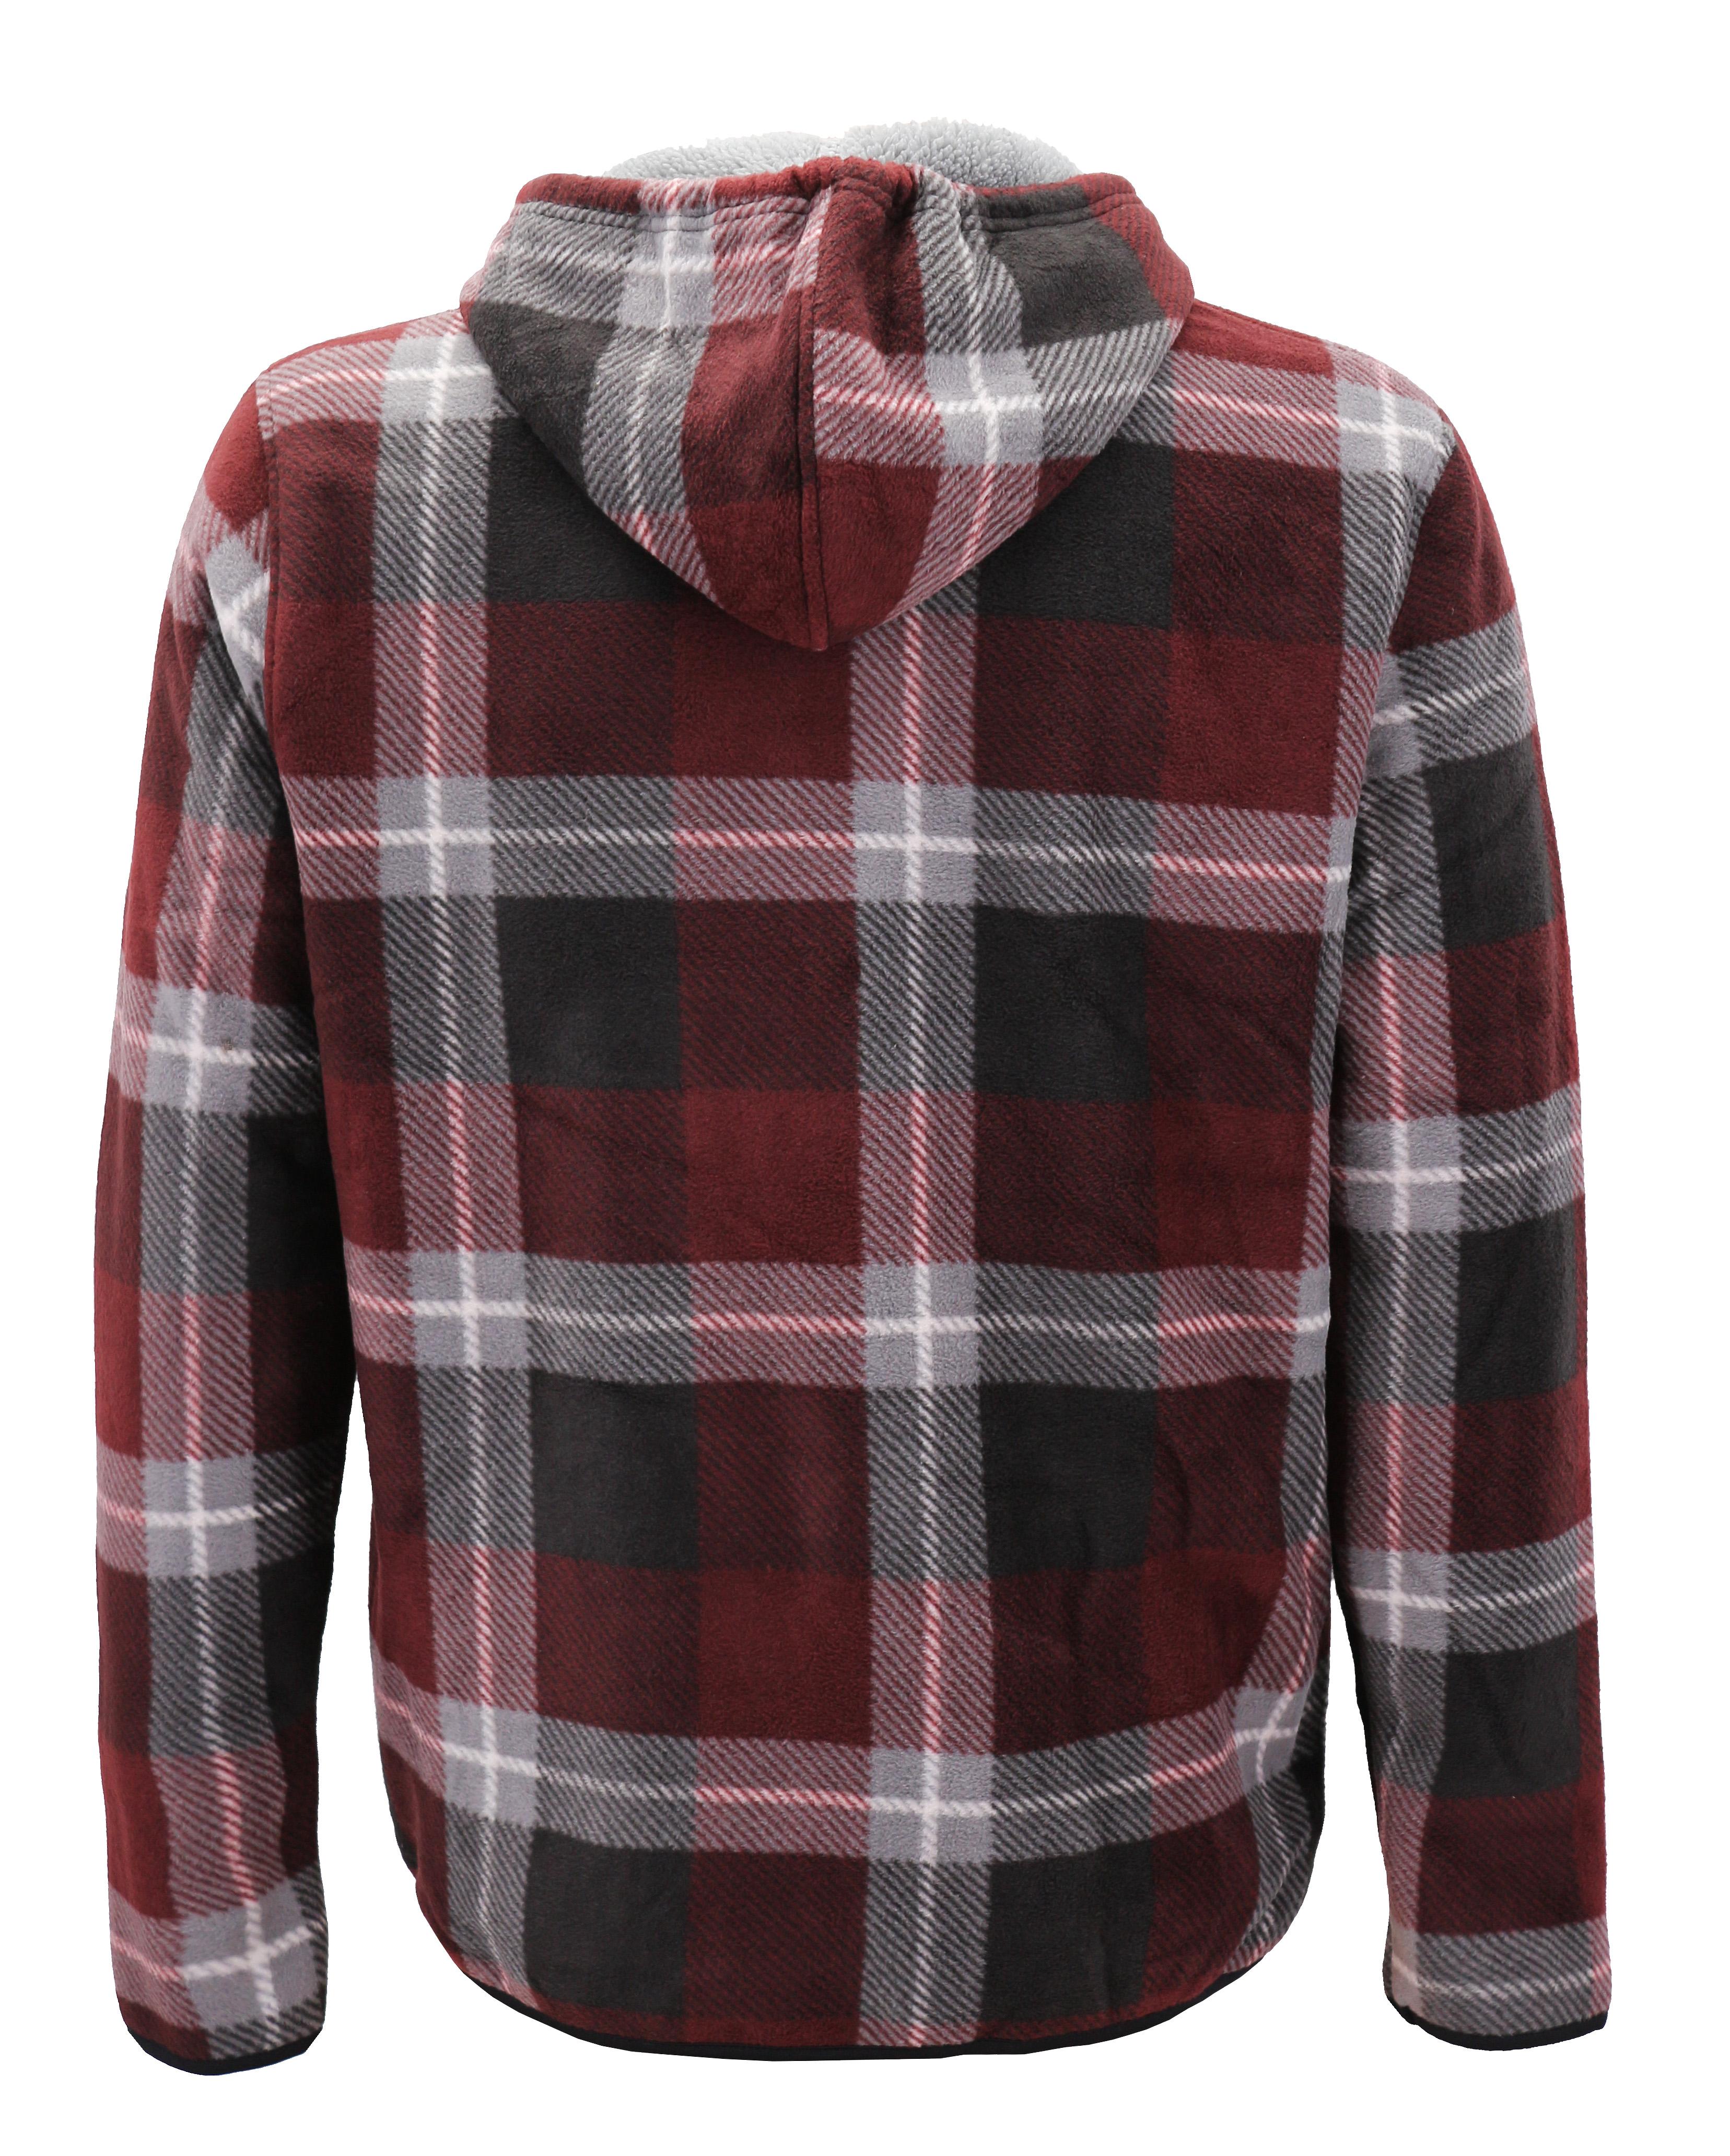 thumbnail 3 - Men-039-s-Casual-Flannel-Zip-Up-Fleece-Lined-Plaid-Sherpa-Hoodie-Lightweight-Jacket